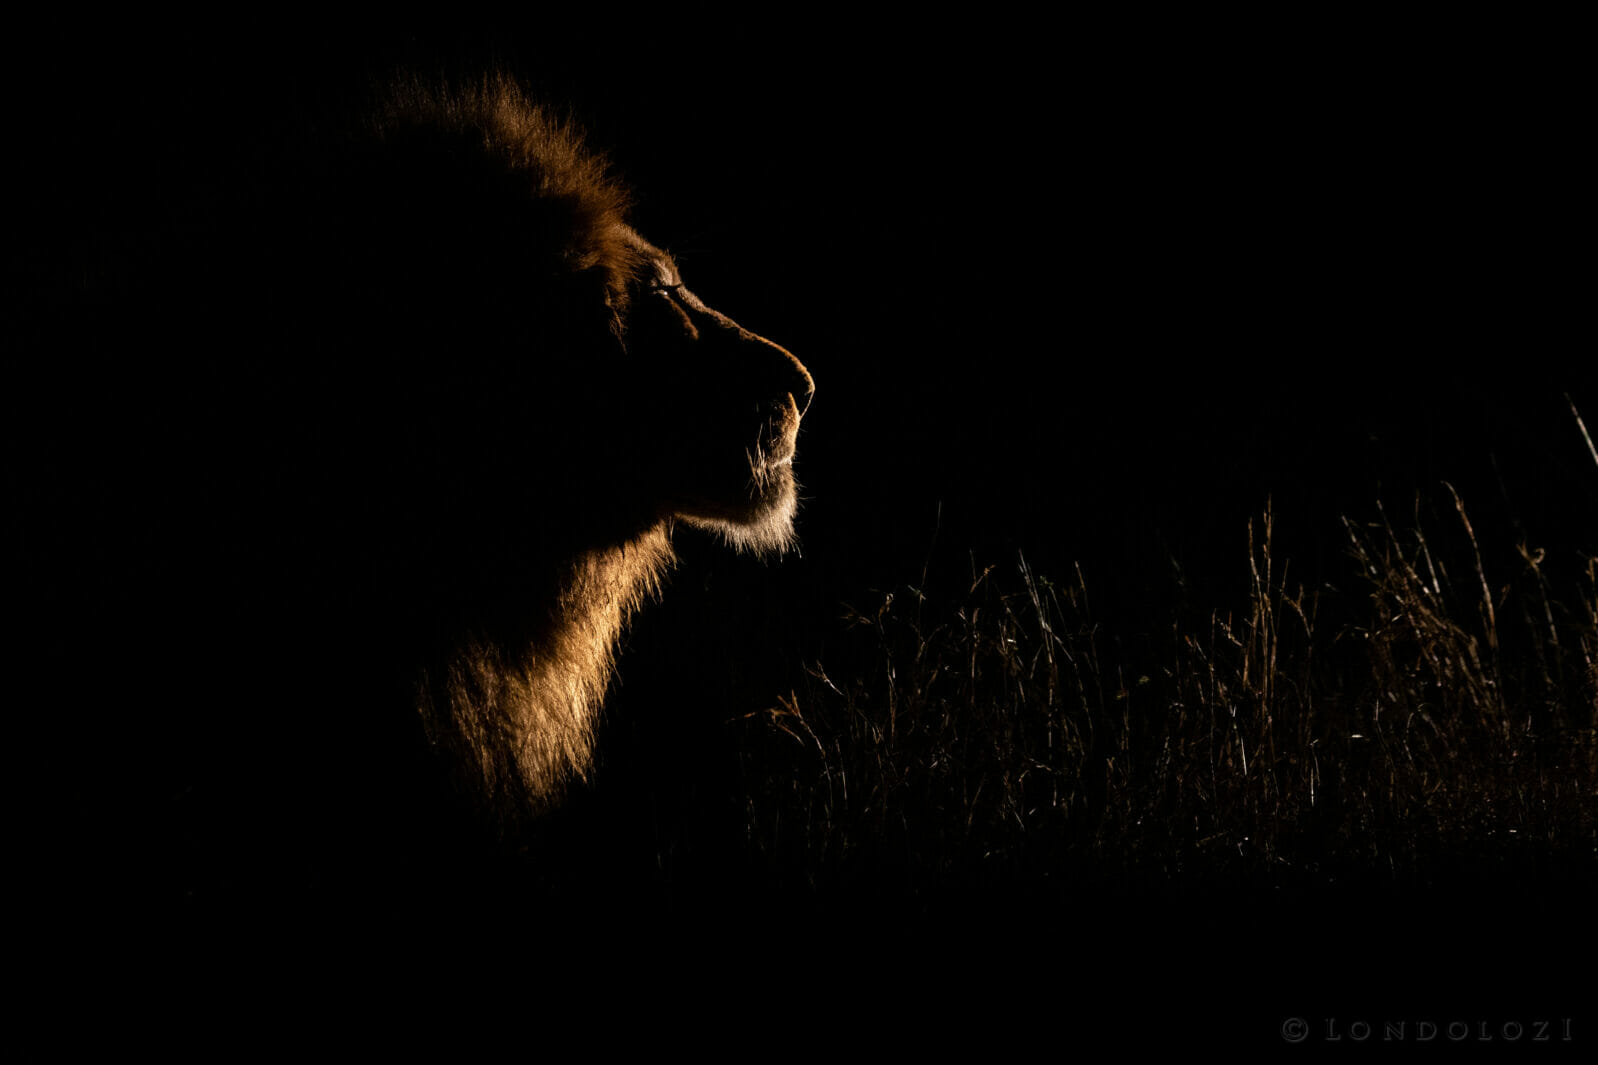 Night Birmingham Male Lion Dean De La Rey Dlr 09:21